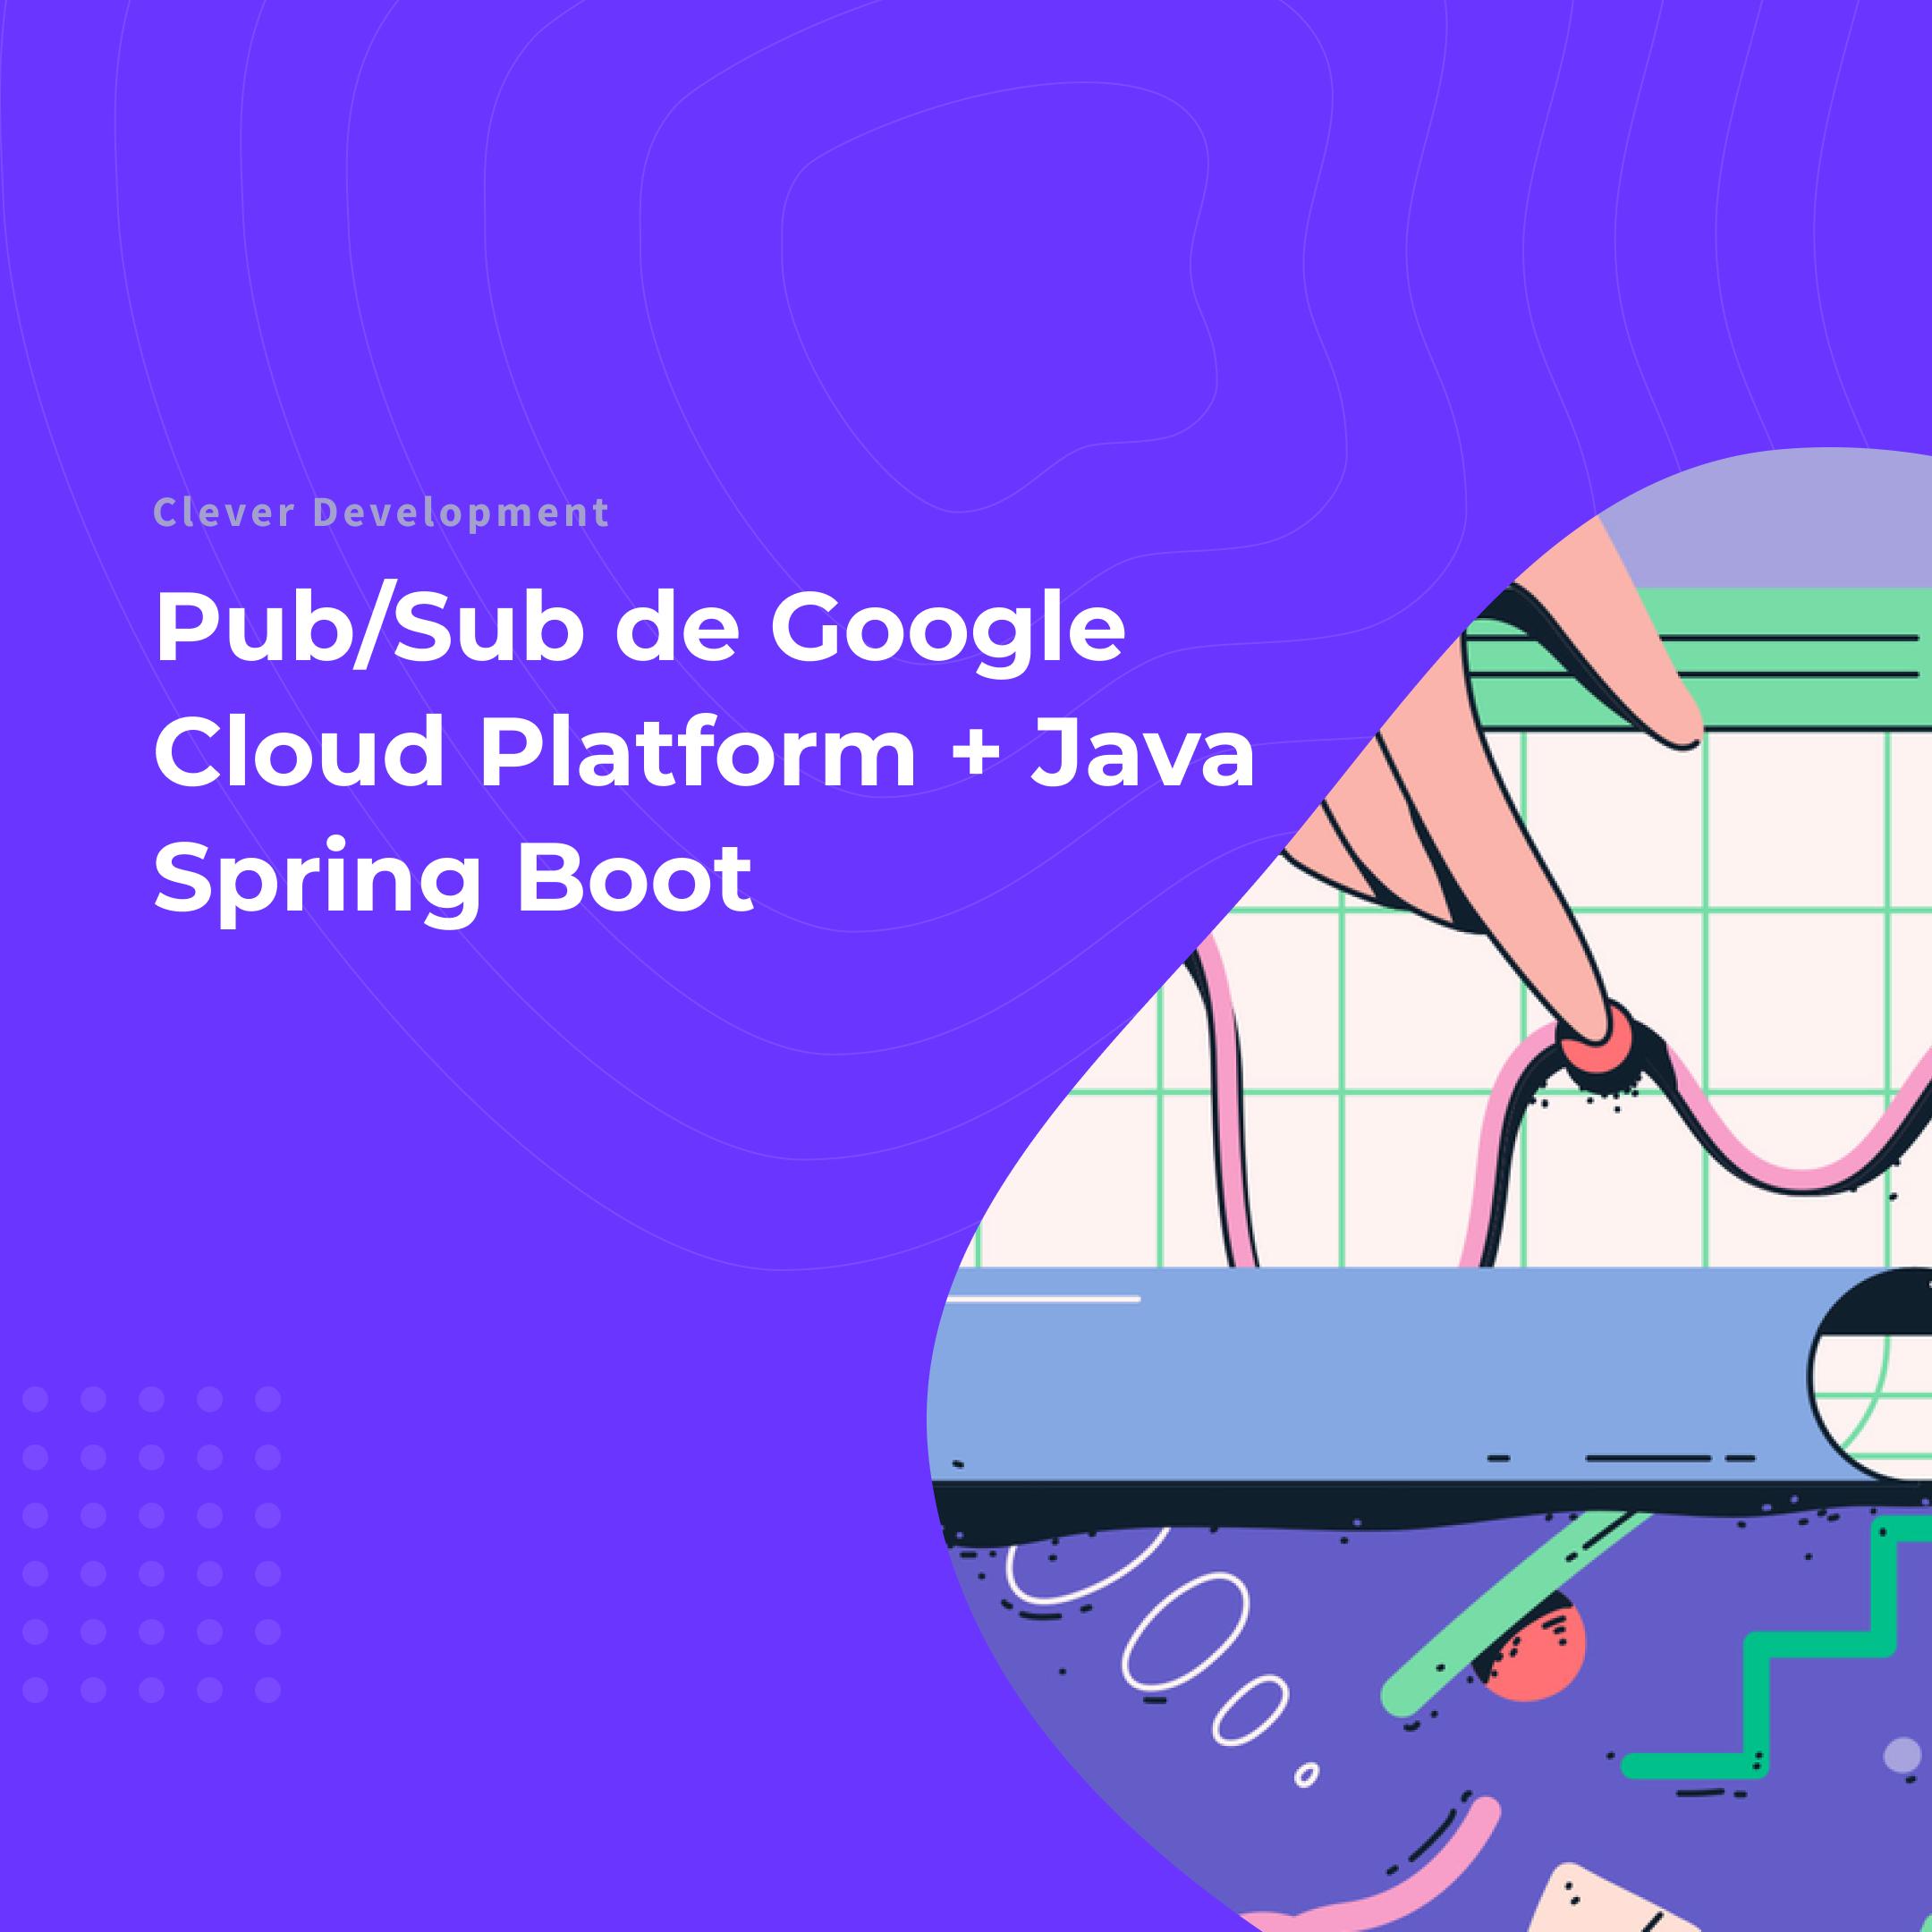 Pub/Sub de Google Cloud Platform + Java Spring Boot